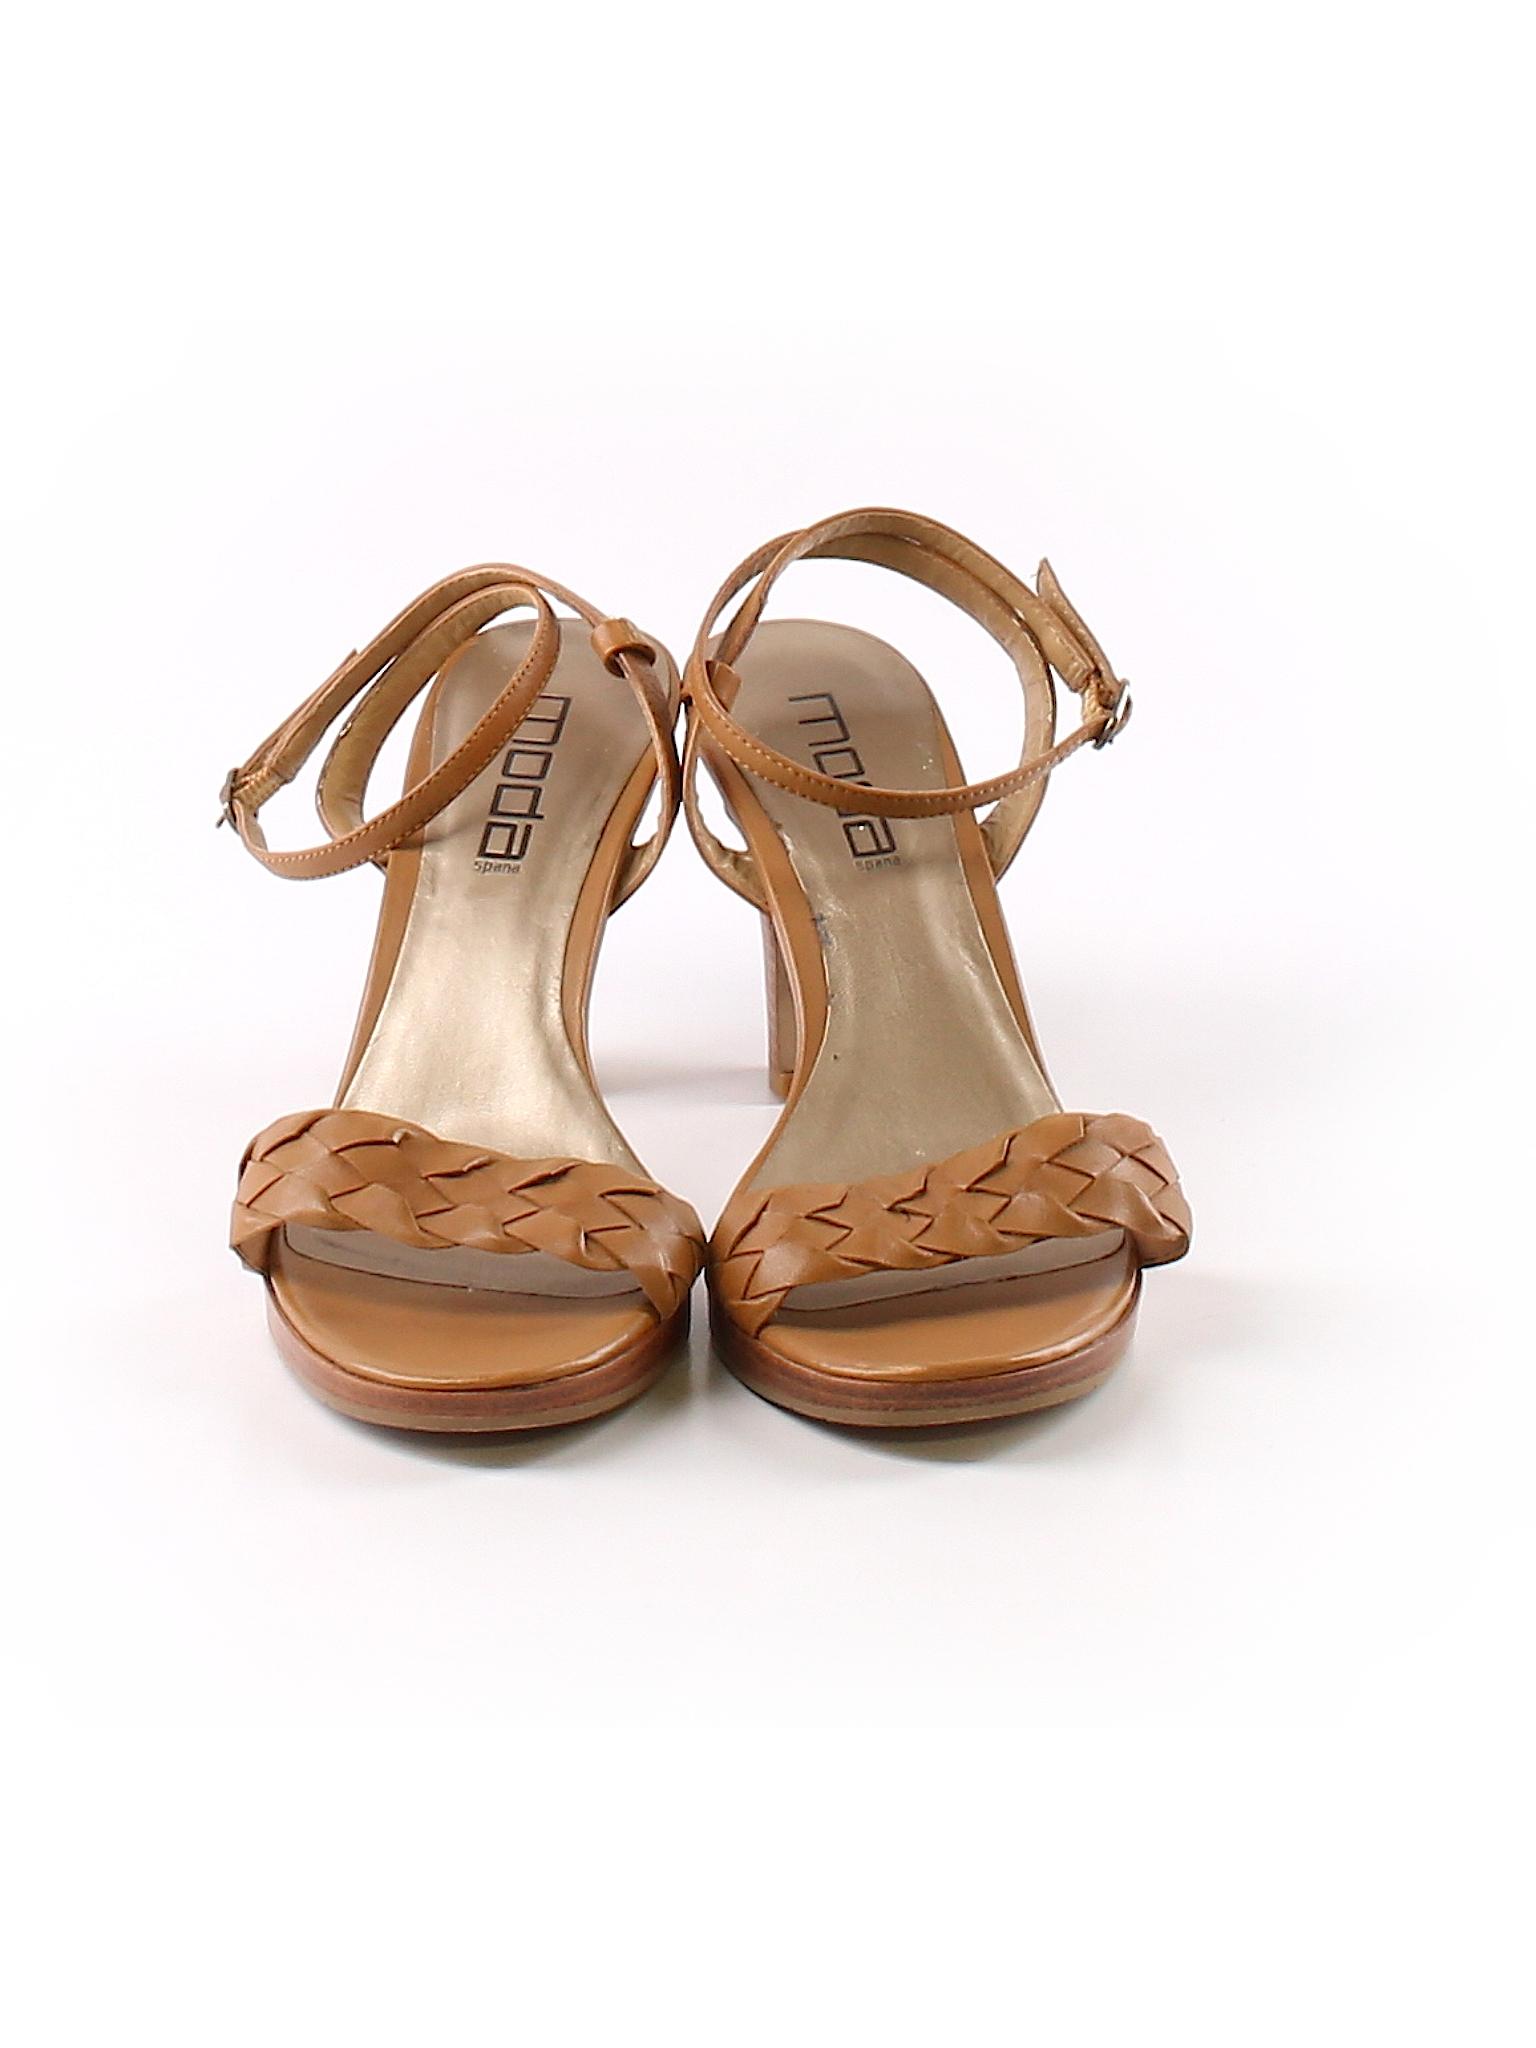 Spana Moda promotion Heels Boutique Boutique promotion Moda wFqIWSX